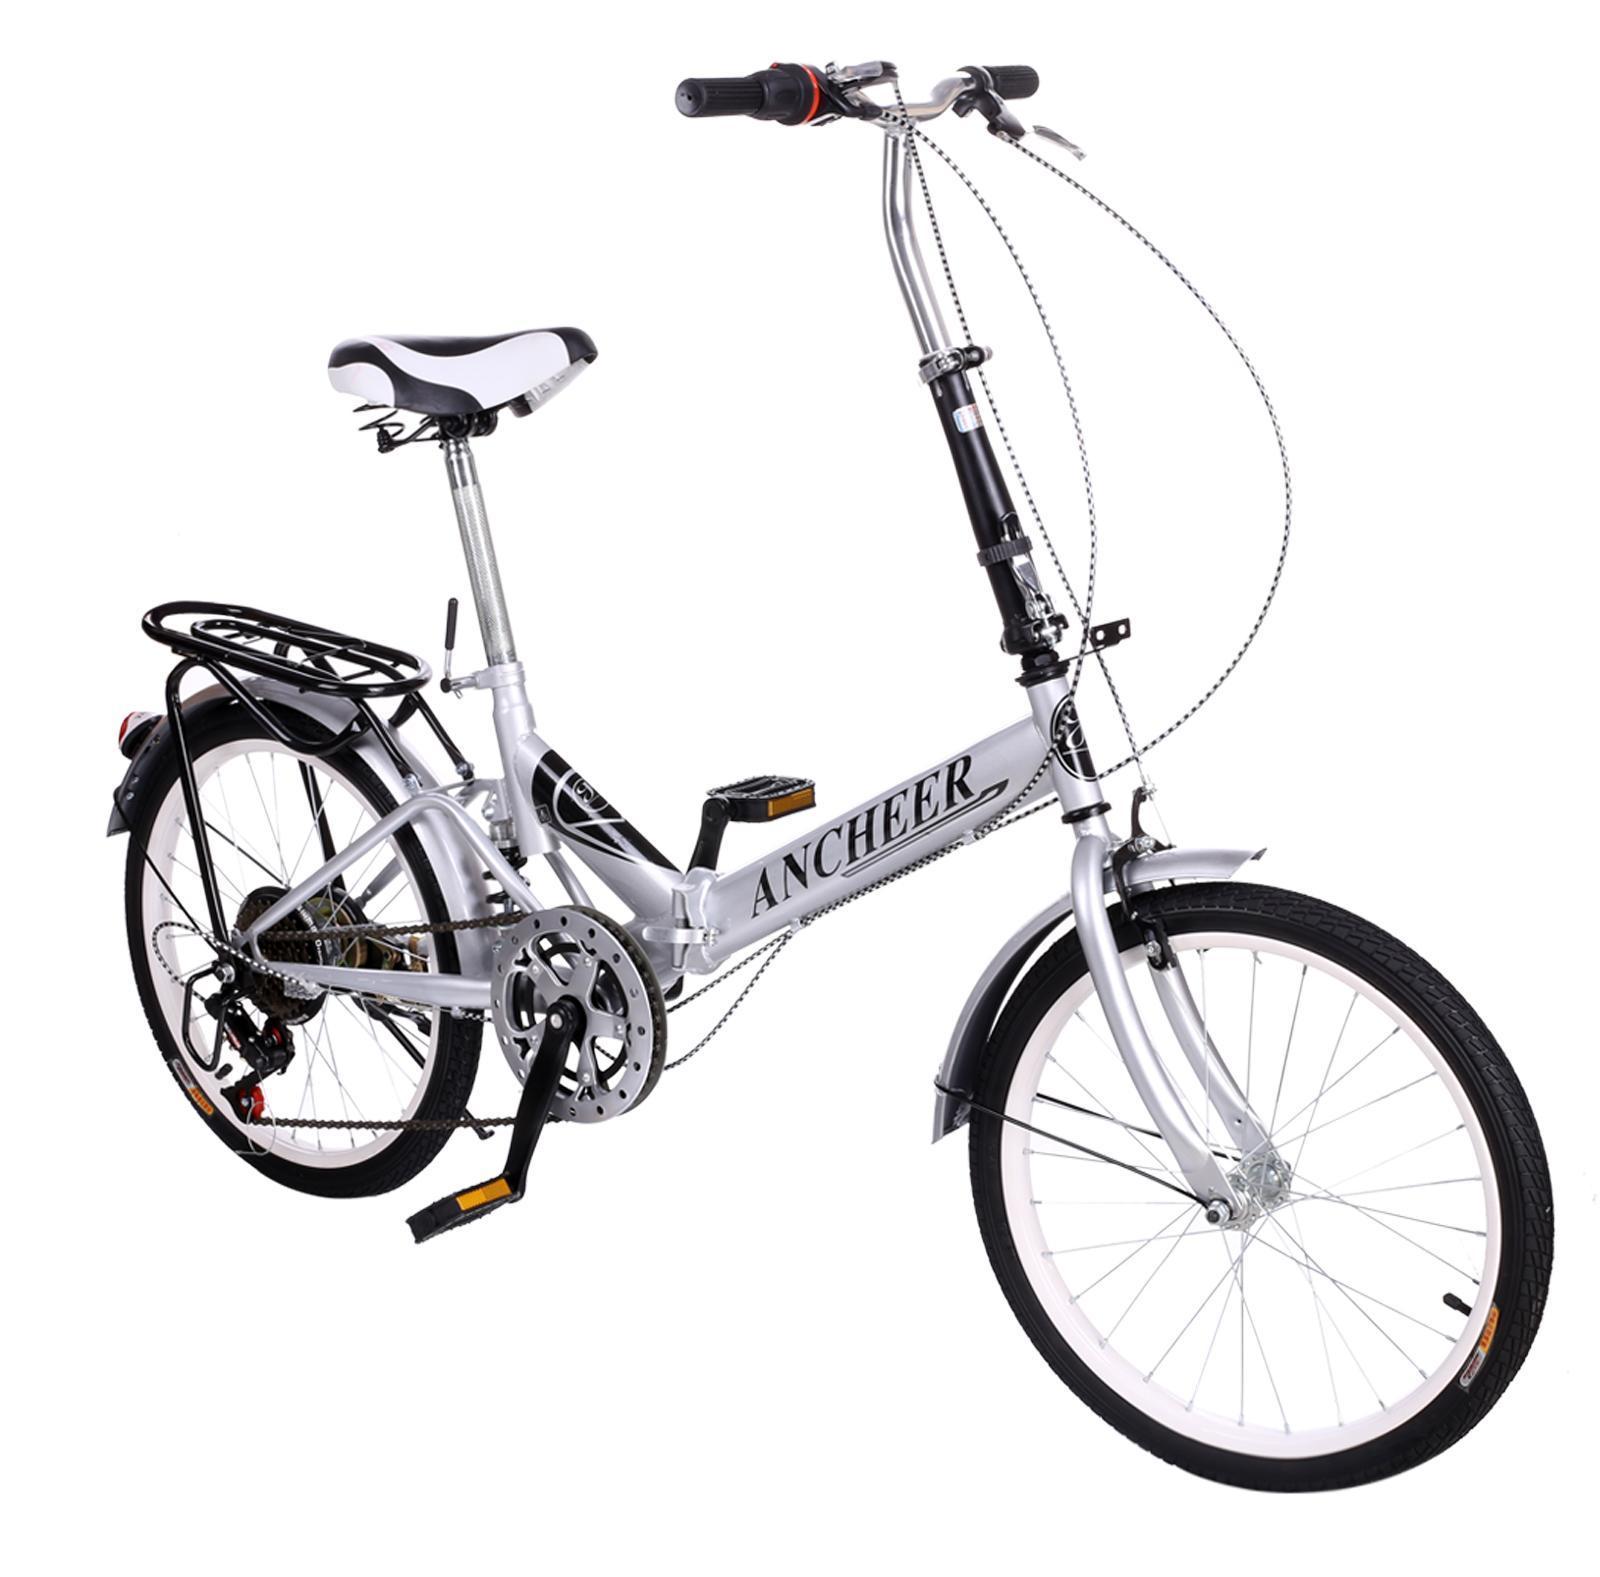 Ancheer Folding Bike 20 6 Speed Bicycle Fold Storage City